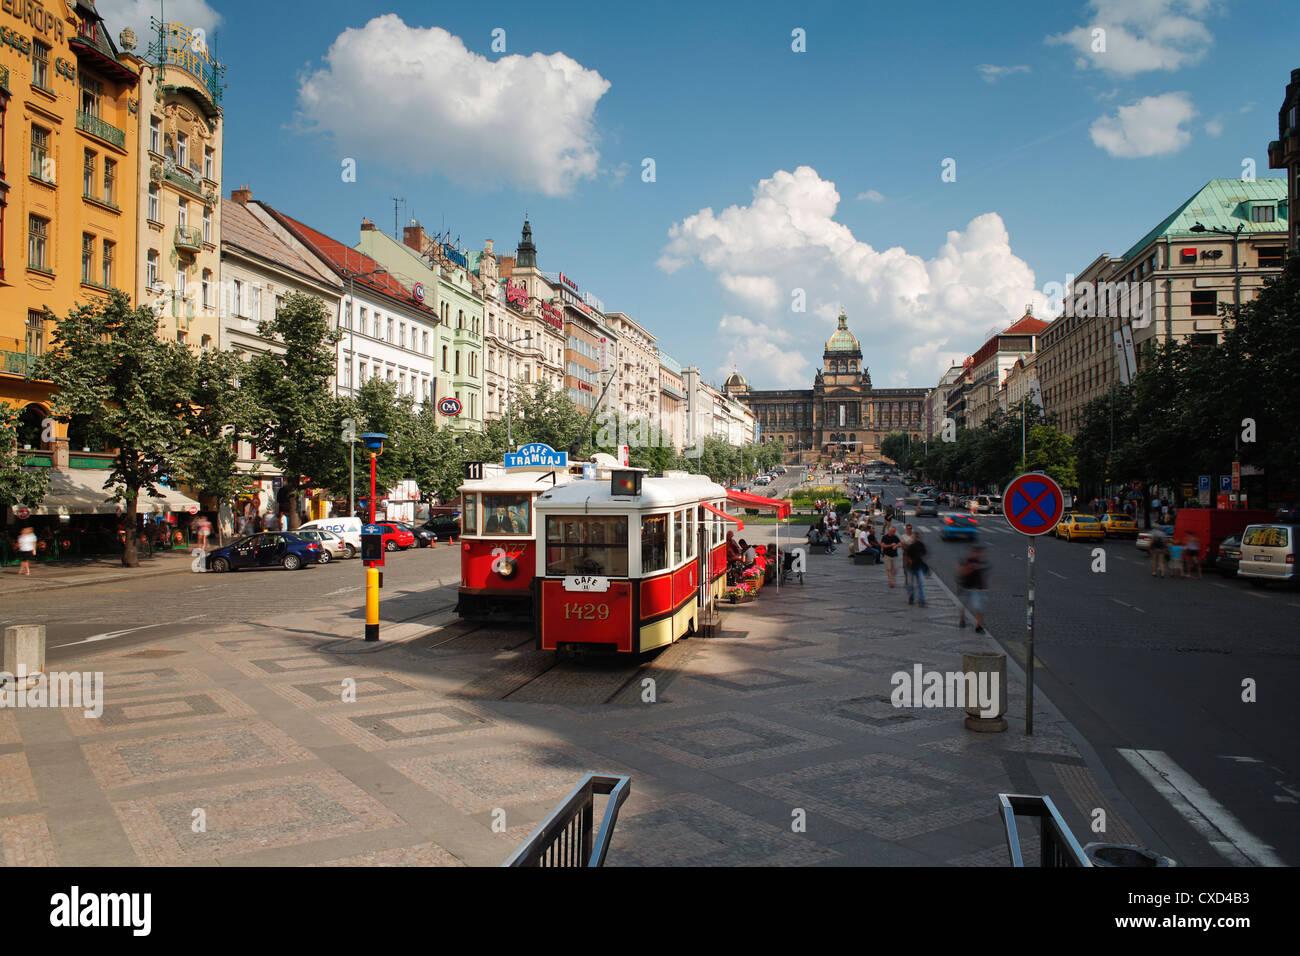 Piazza Venceslao, Praga, Repubblica Ceca, Europa Immagini Stock